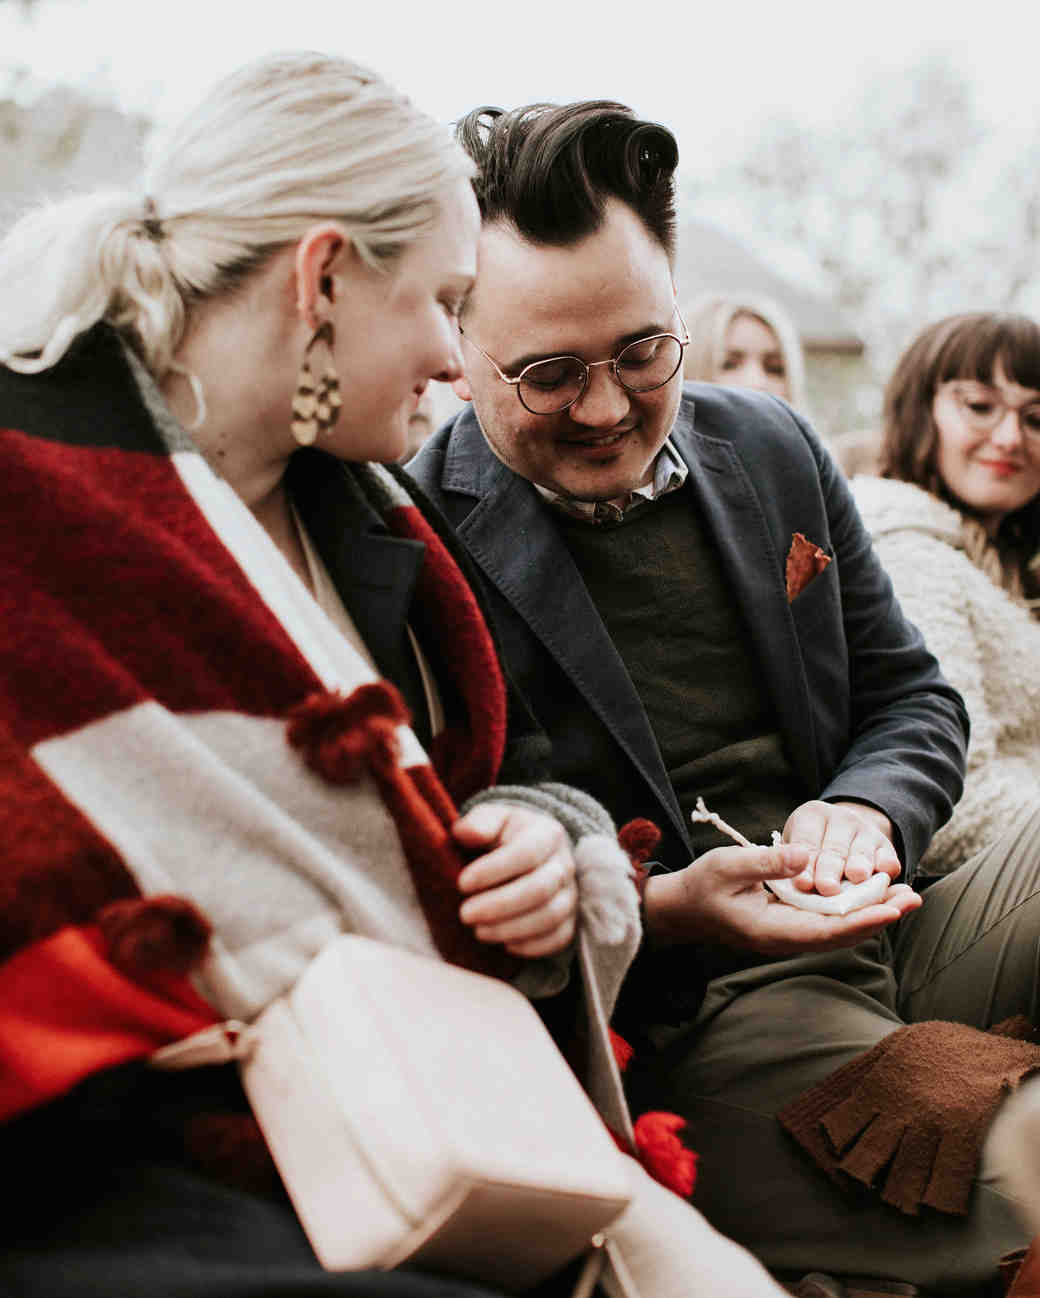 shannon jason wedding ring blessing